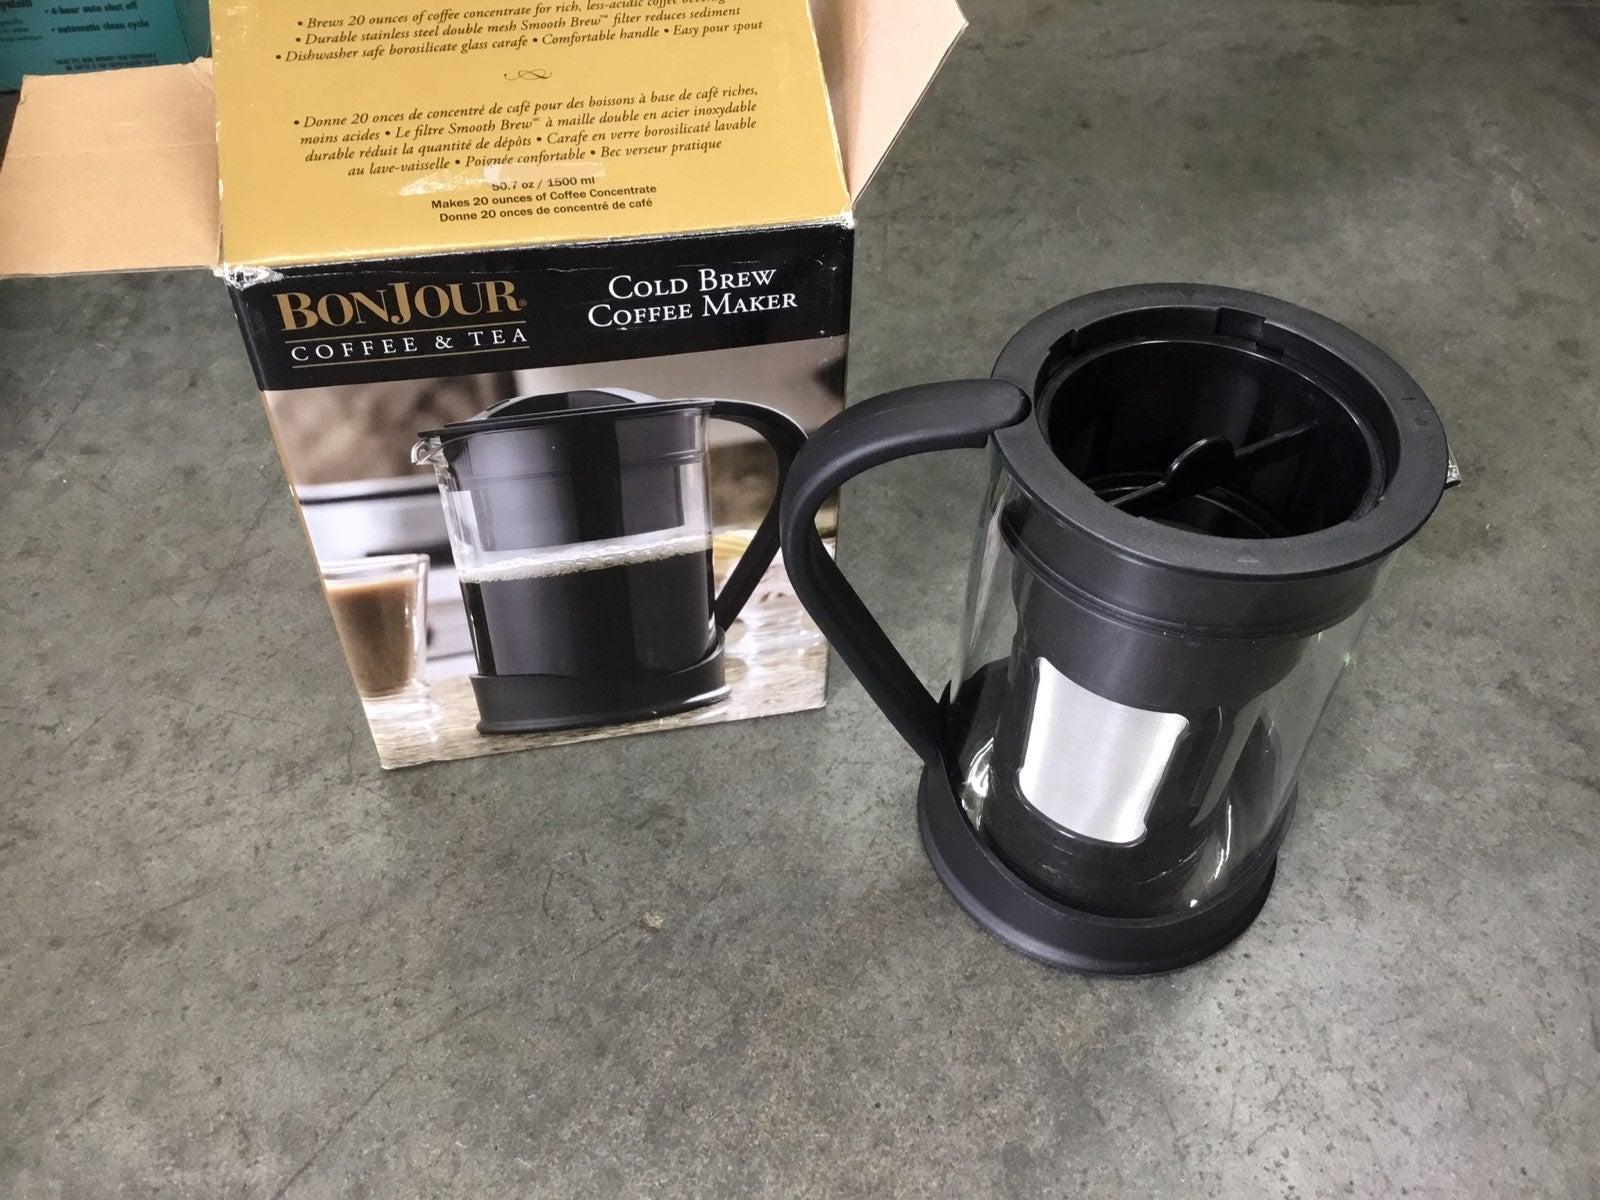 Bonjour cold brew coffee maker